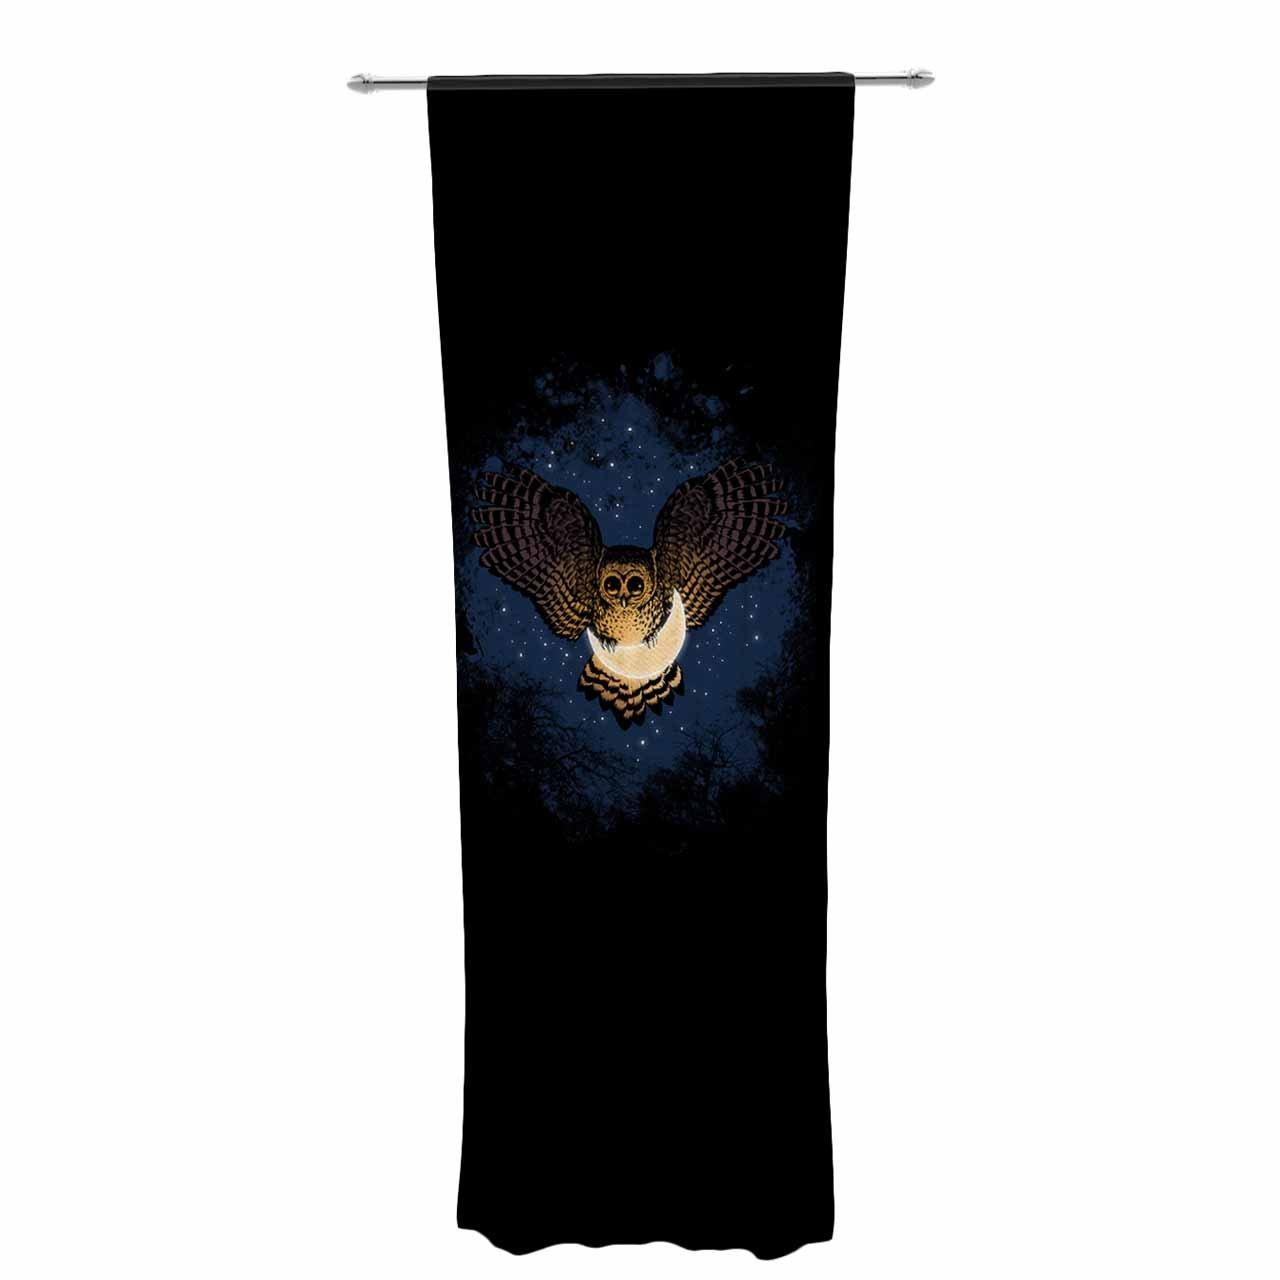 Kess InHouse BarmalisiRTB Catch The Moon Blue Yellow Digital Decorative Set 30 x 84 Sheer Curtains